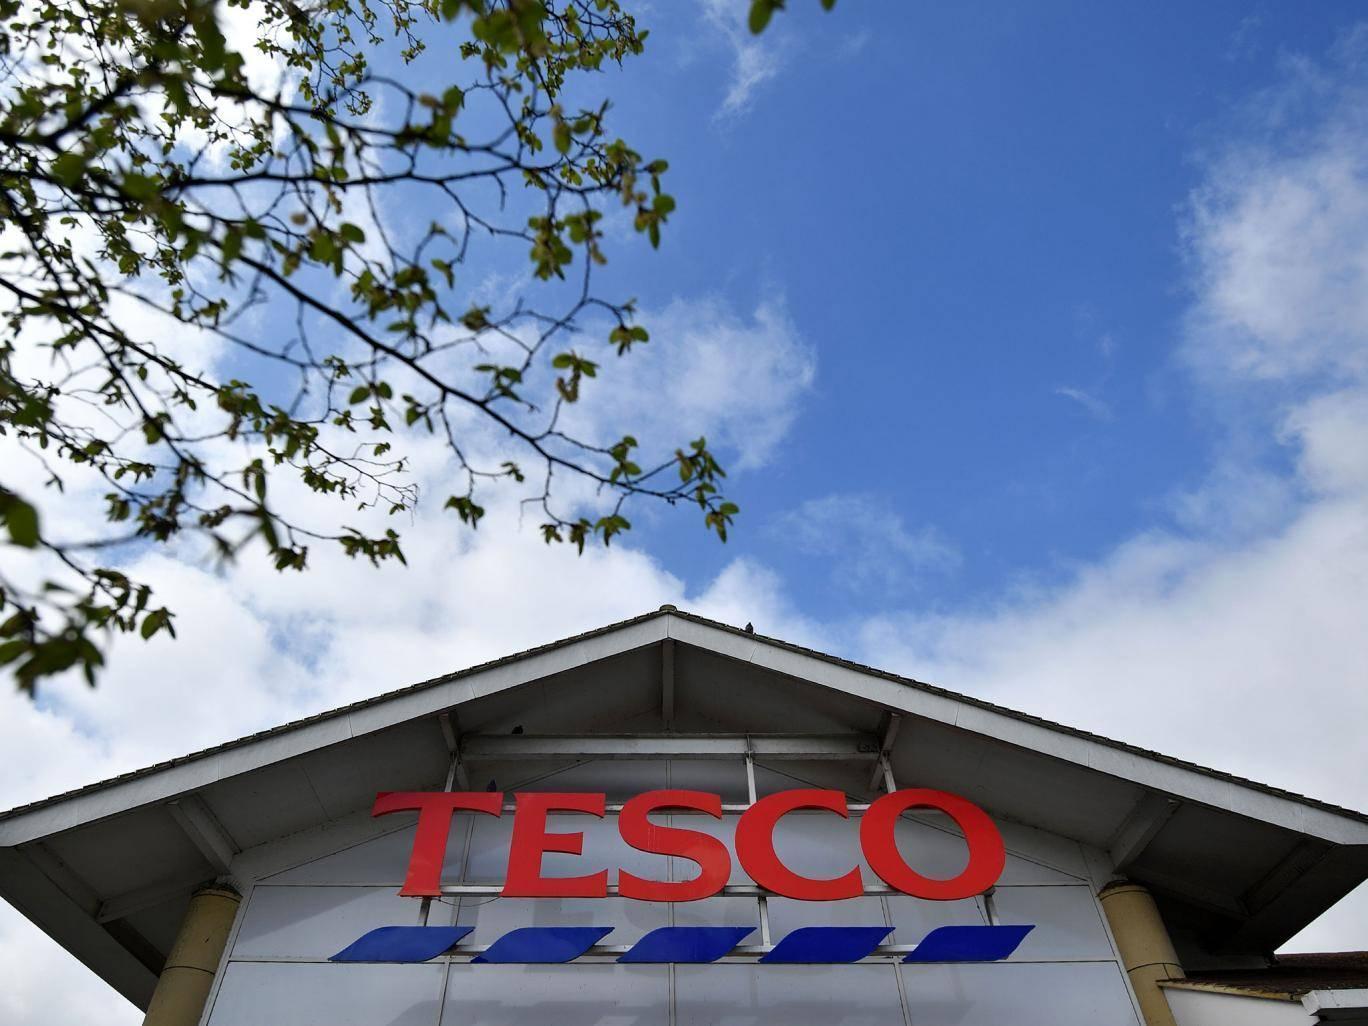 Tesco announces 1,700 job cuts as it 'simplifies' its business